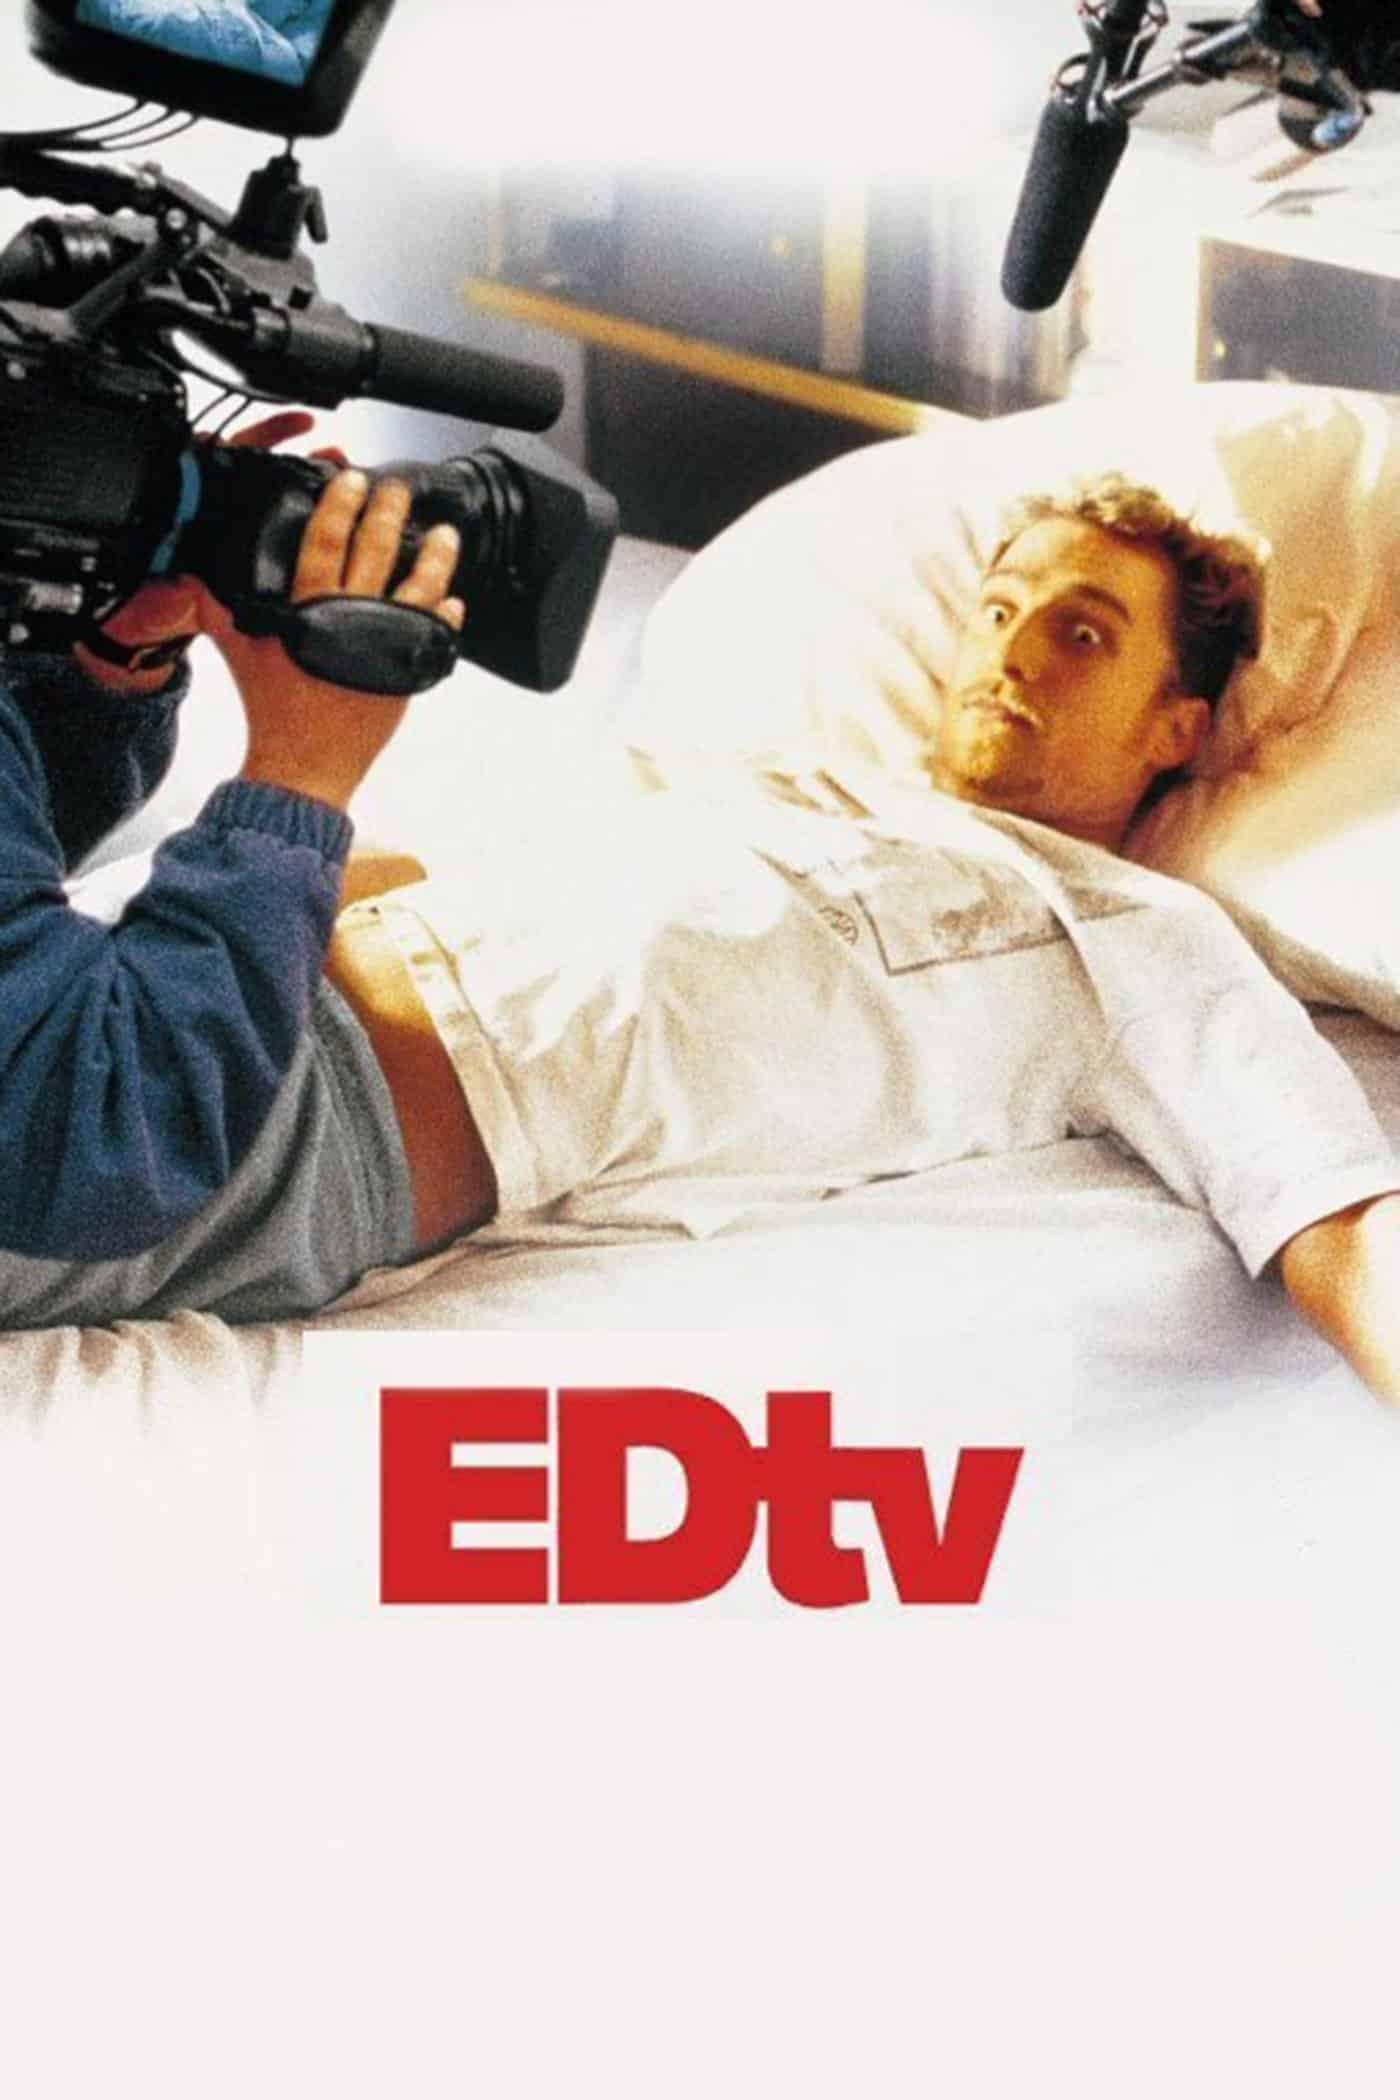 EDtv, 1999